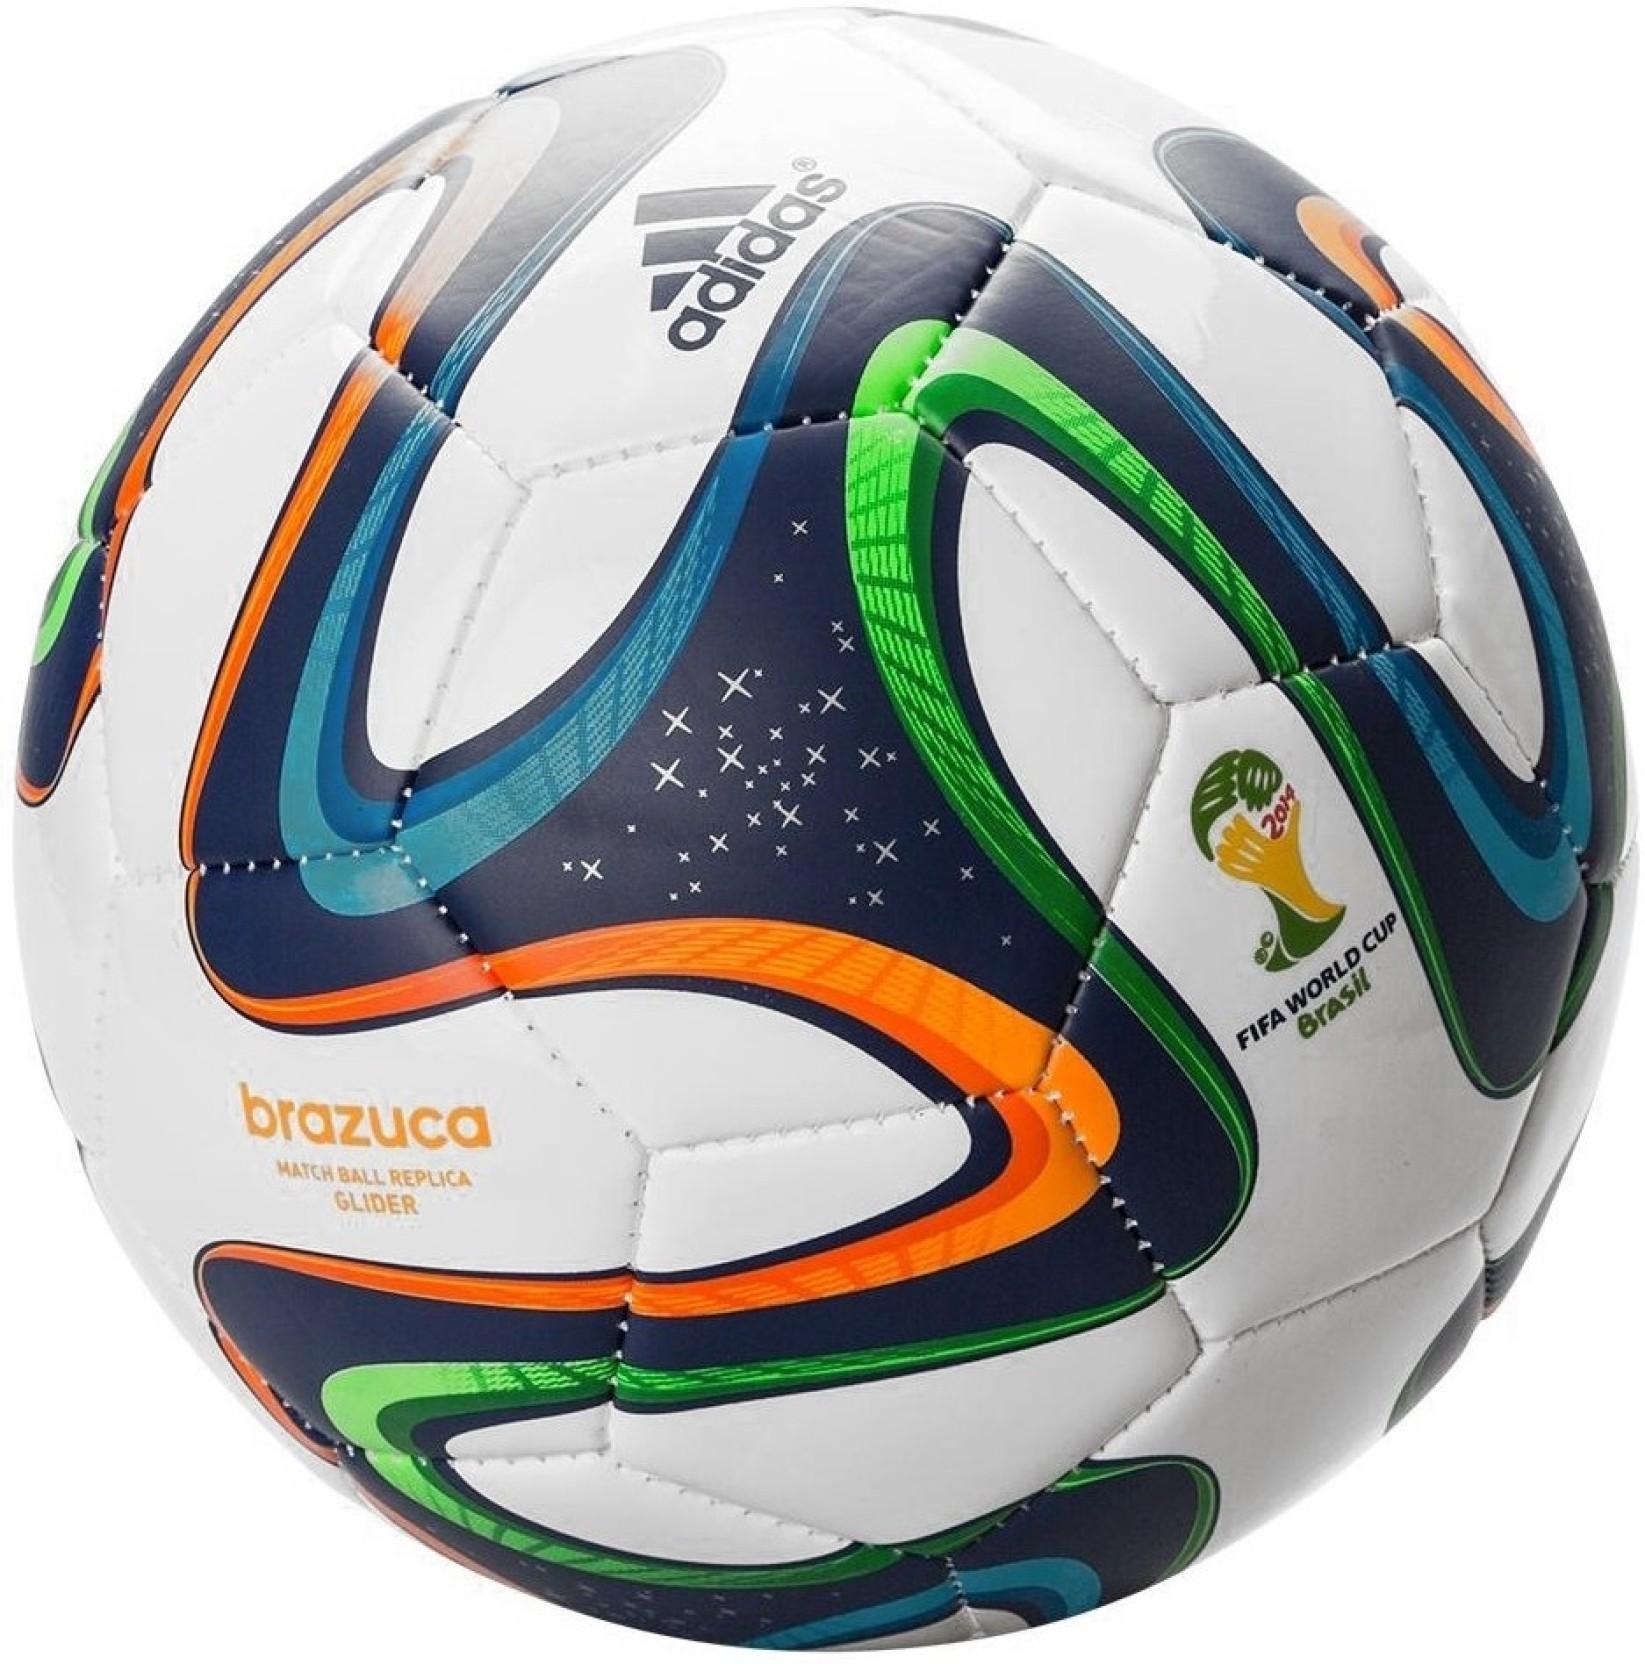 68395fa5f8 Adidas brazuca glider match ball replica football size pack of multicolor  jpg 1645x1664 Adidas brazuca